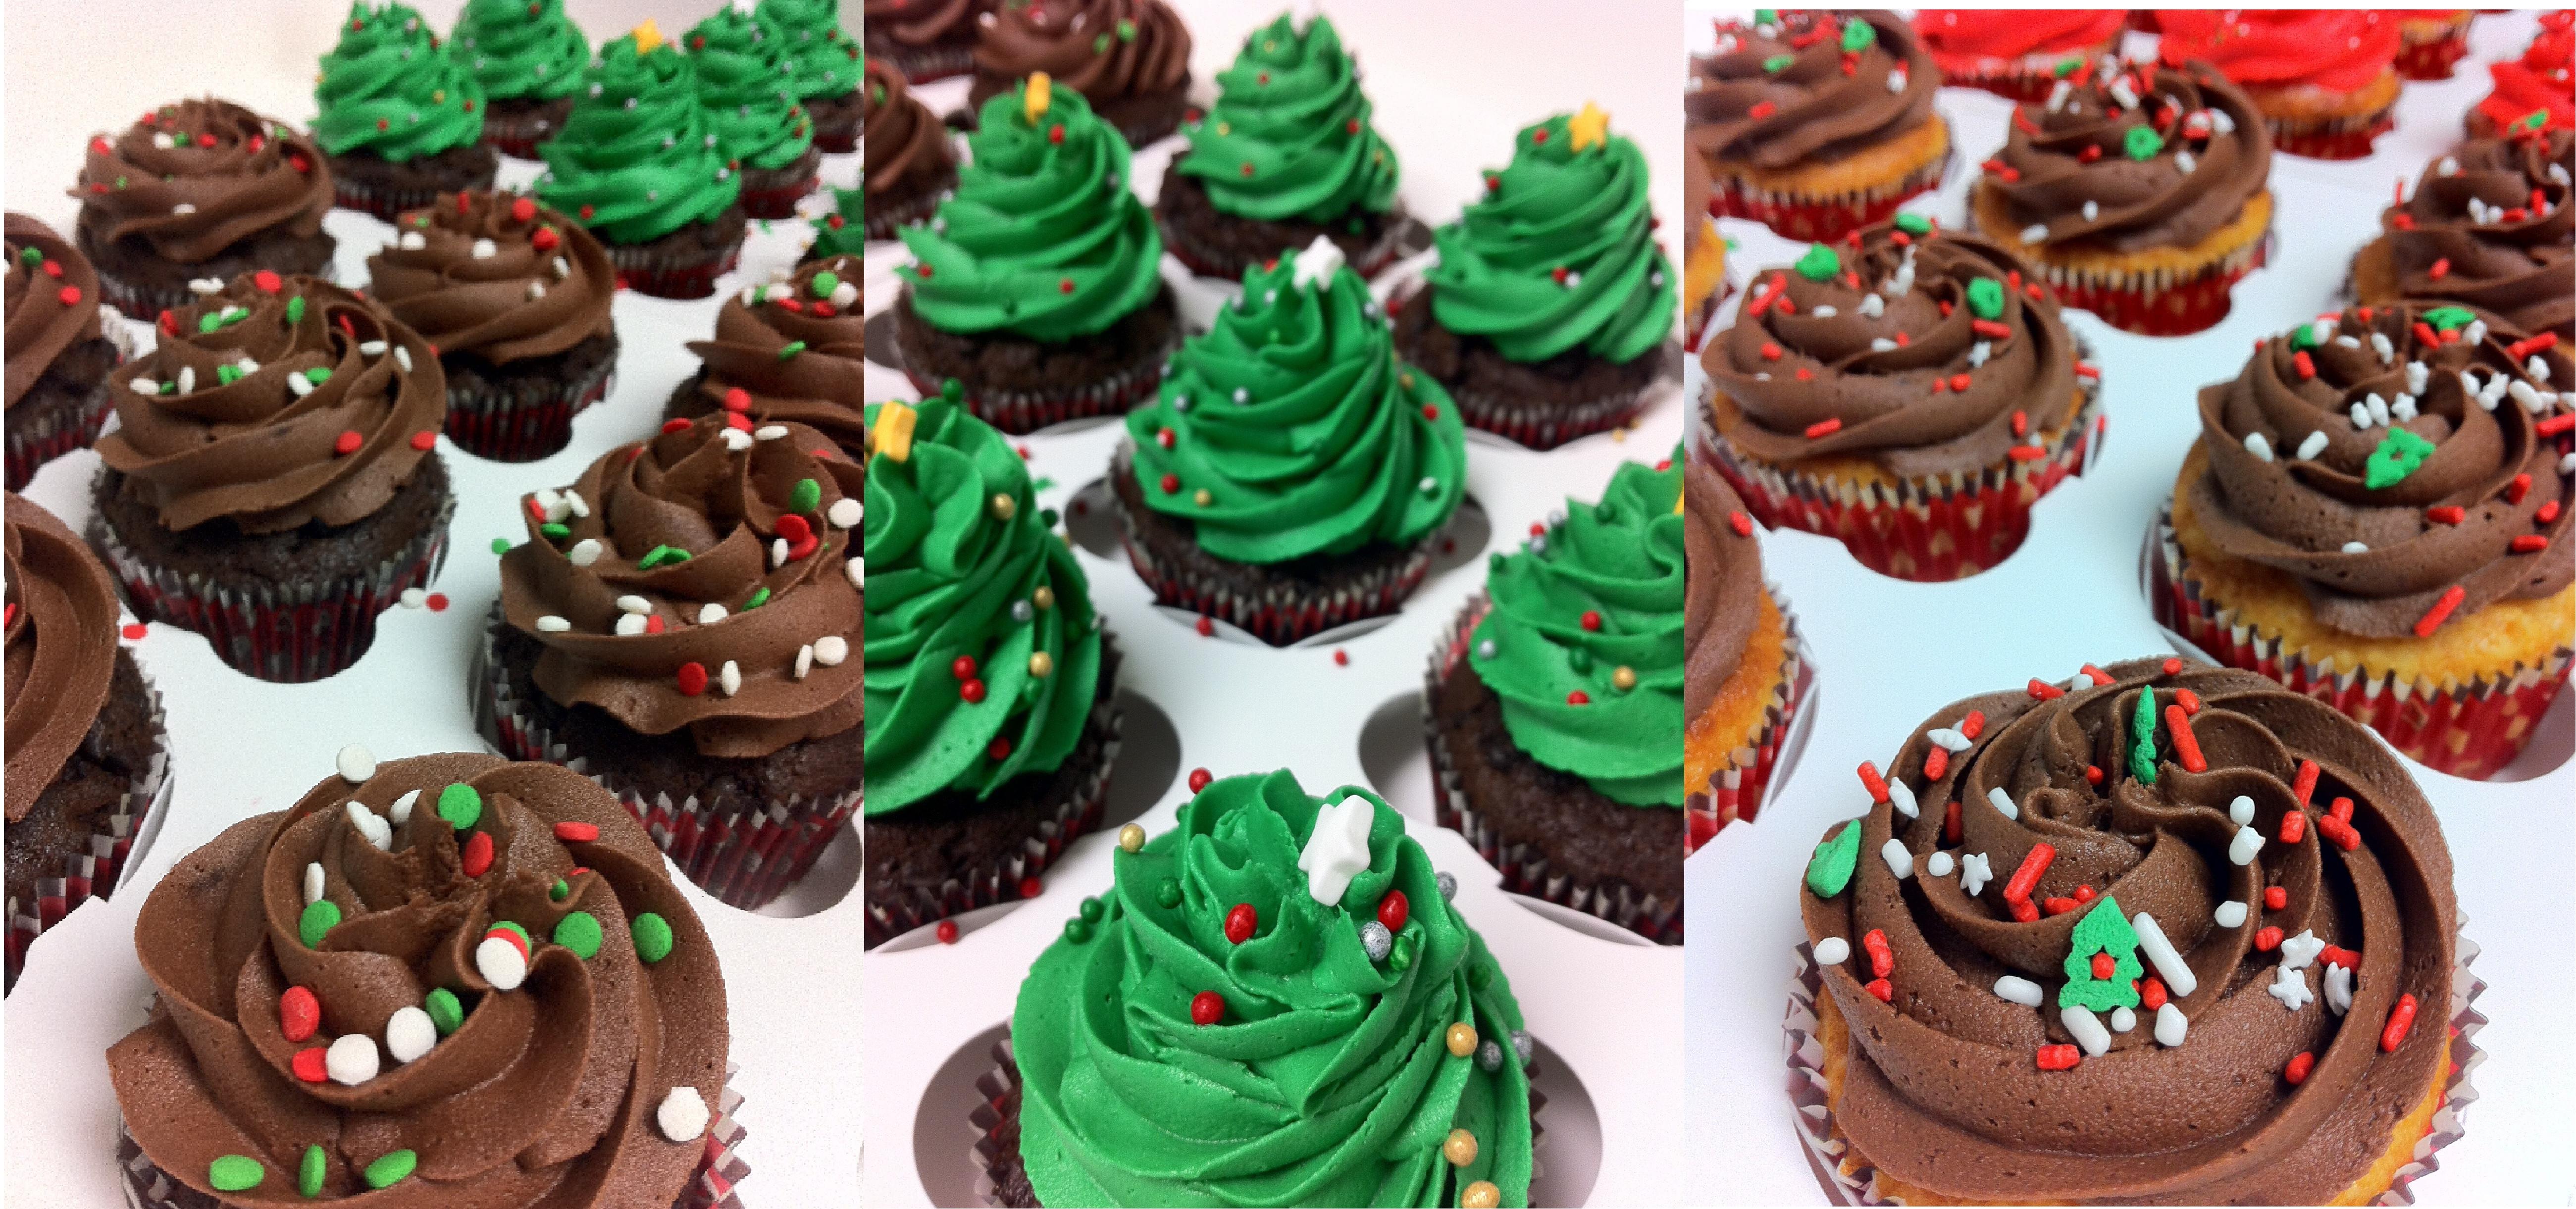 Christmas Cakes And Cupcakes  Merry Christmas Holiday Cakes Chocolate Christmas